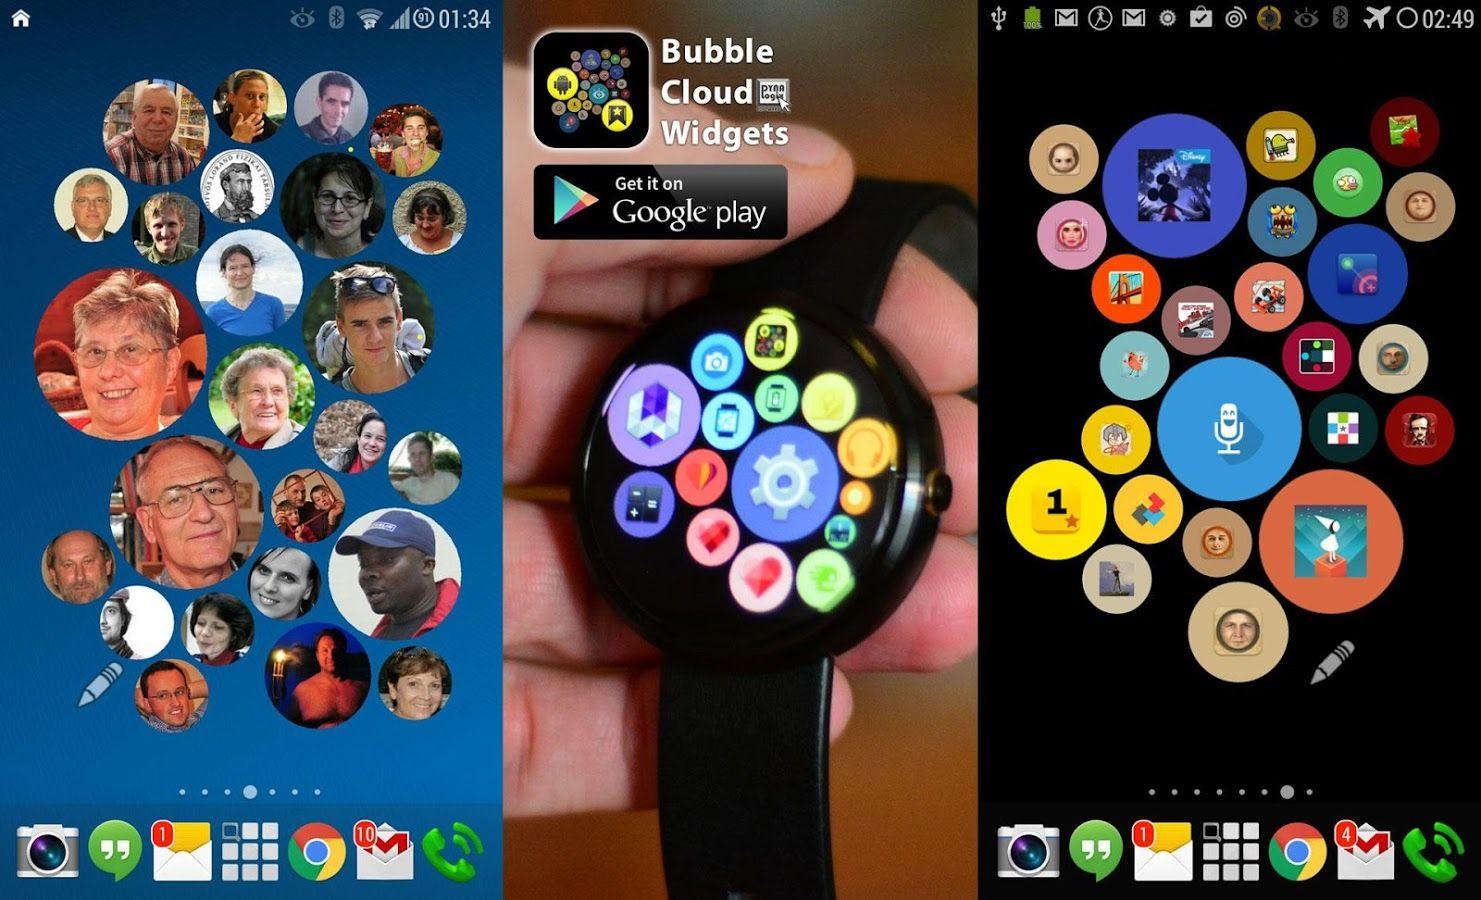 Bubble cloud widget